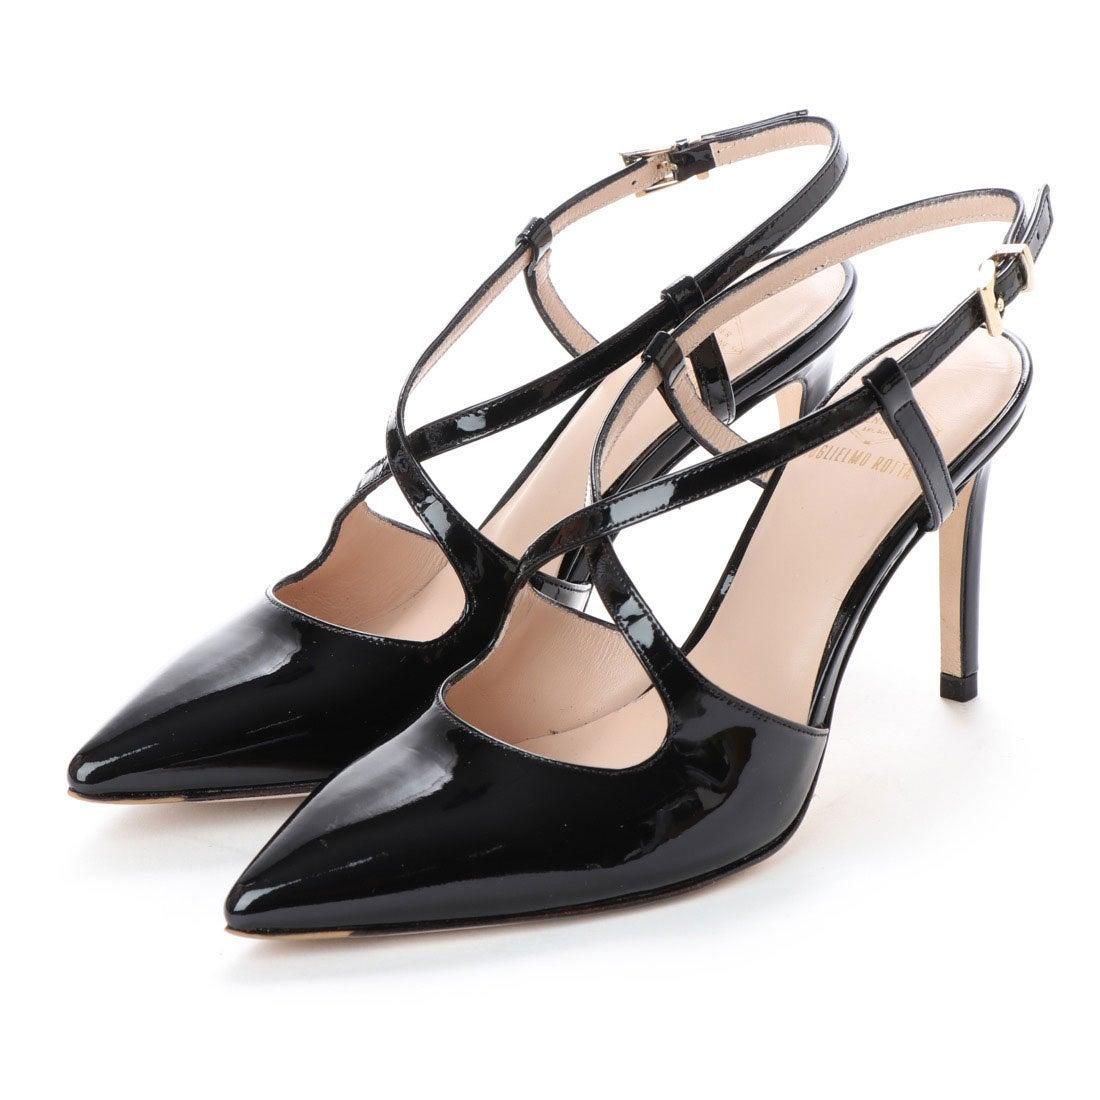 【SALE 65%OFF】ナンバートゥエンティワン NUMBER TWENTY-ONE 婦人靴 (NERO) レディース